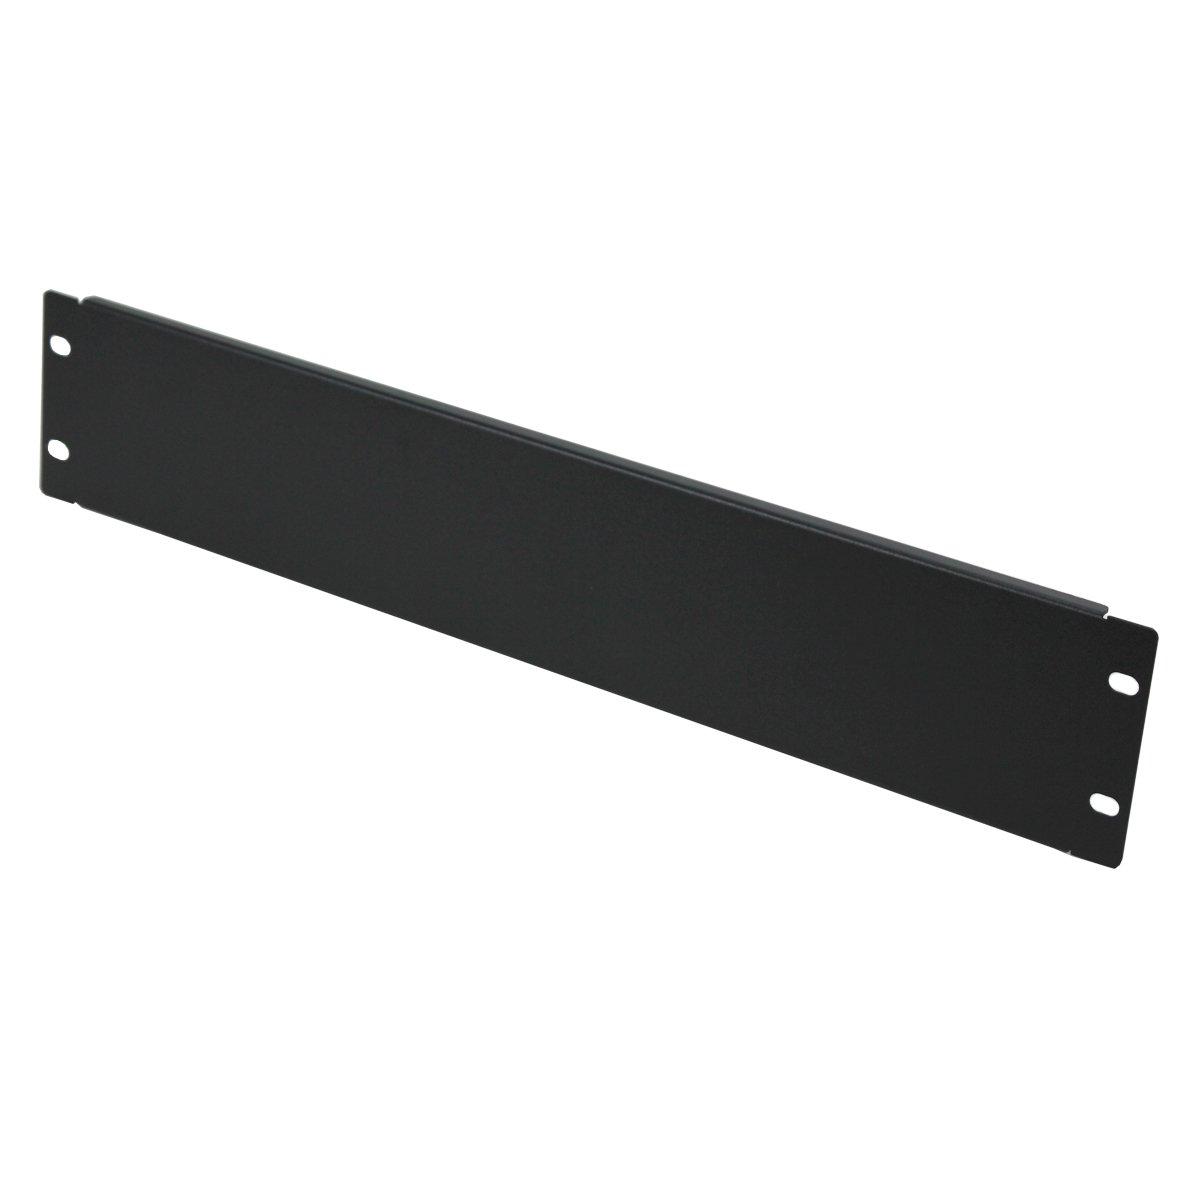 Navepoint Blank Rack Mount Panel Spacer For 19-Inch Server Network Rack Enclosure Or Cabinet Black (2U)